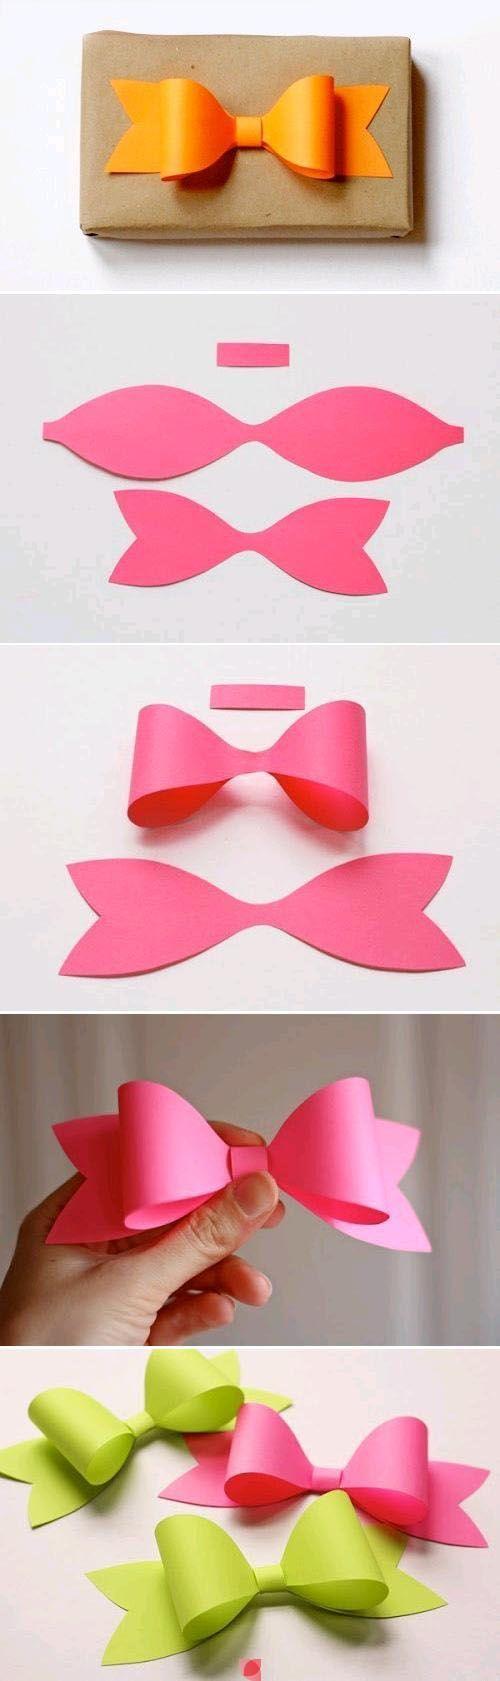 Voluminous paper bow